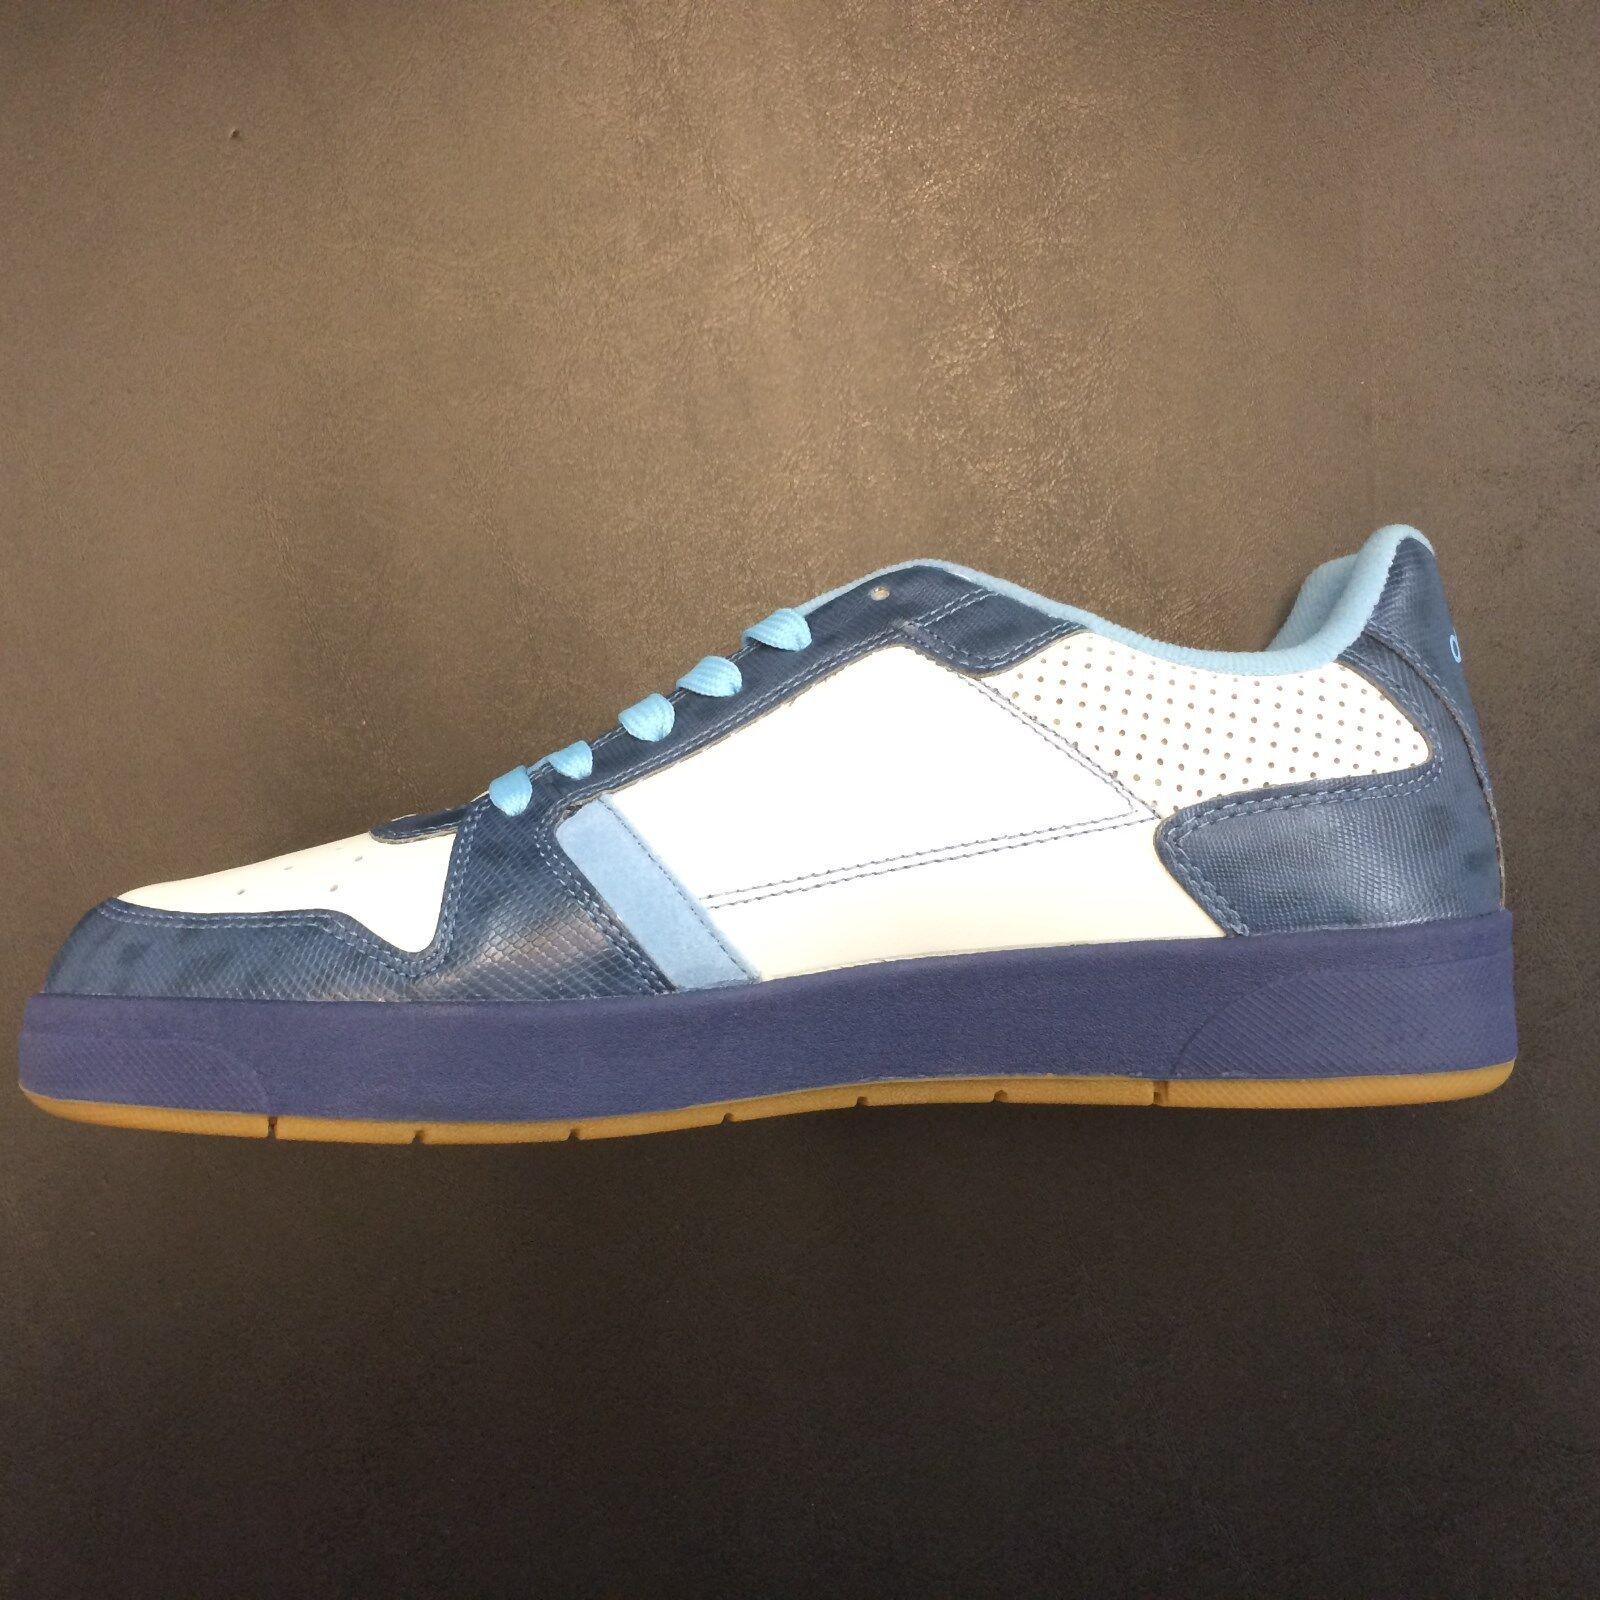 Uomo akademiks INTELLIGENT Navy/White Low Top Top Top Shoes AMA082-482 2e2104